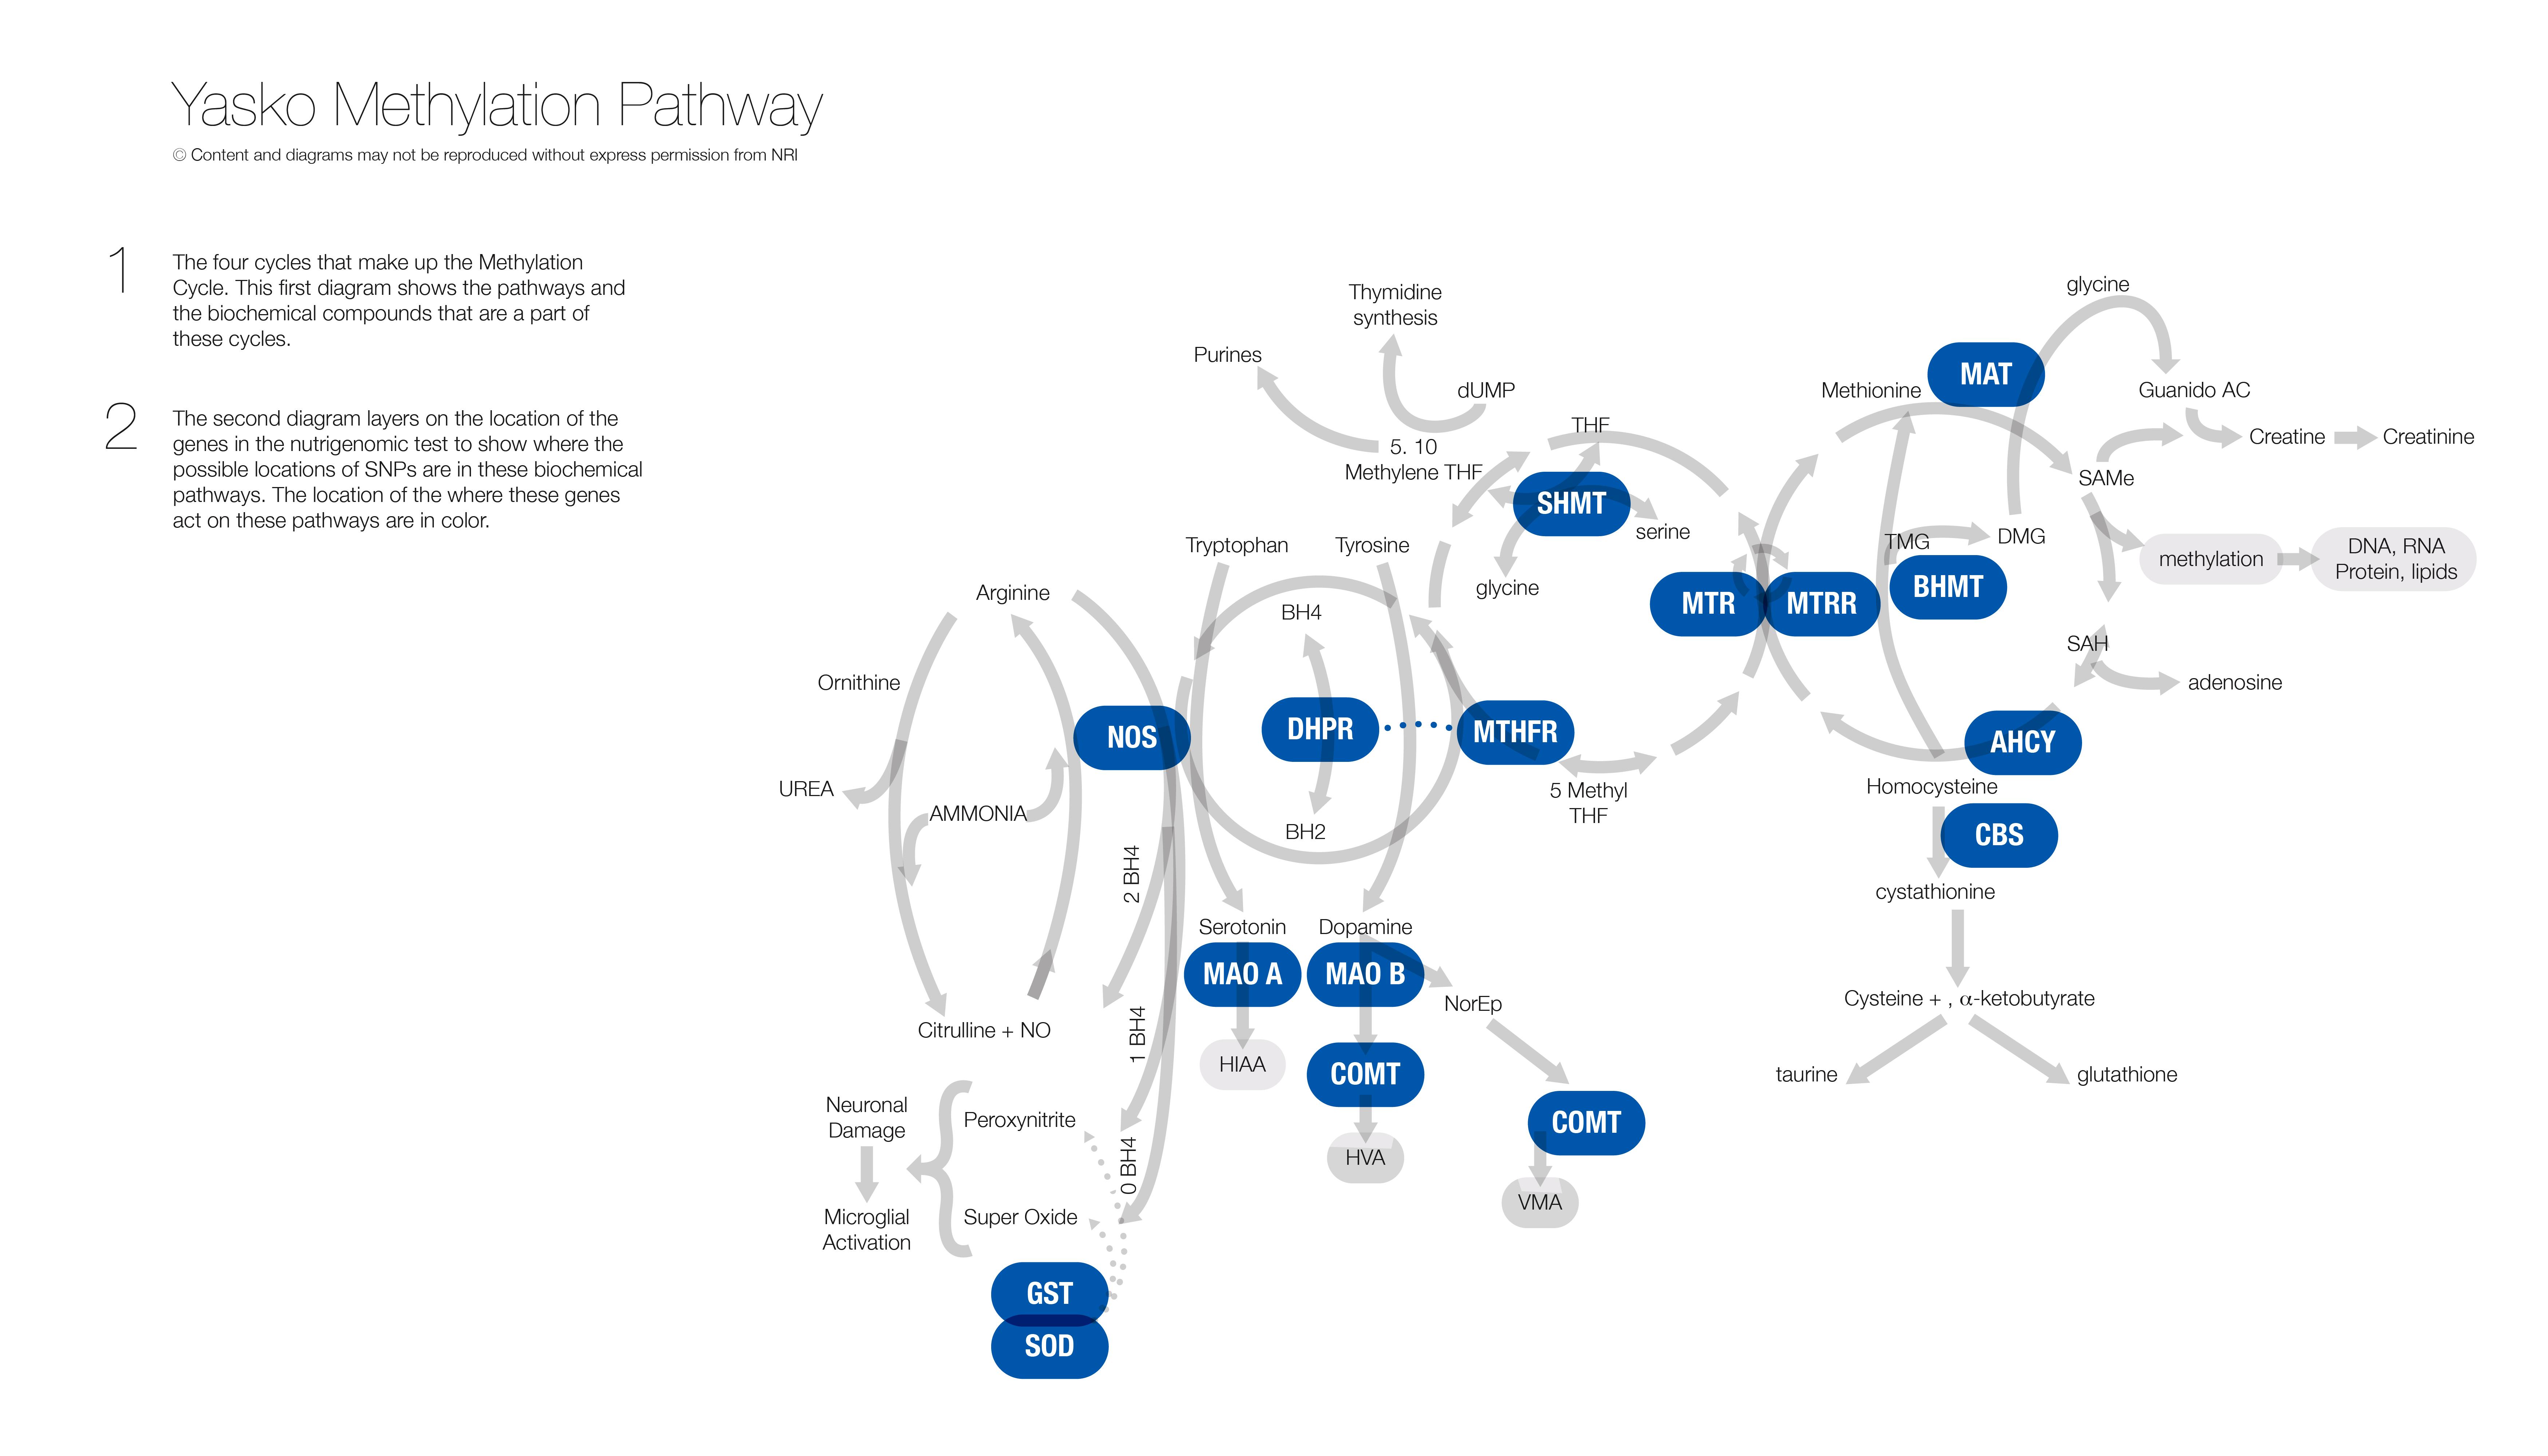 Yasko Methylation Pathway - 2